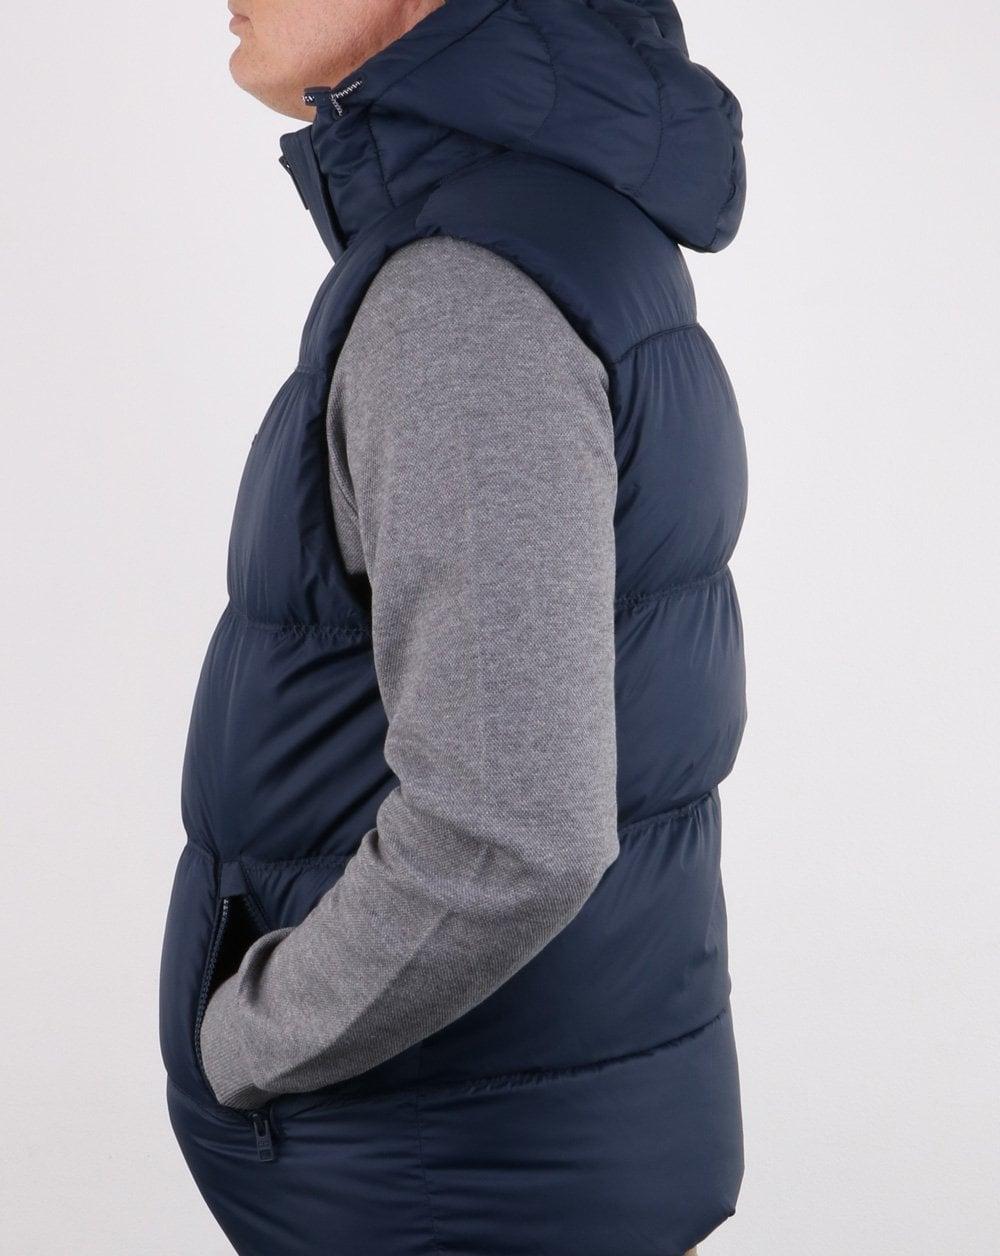 Tommy Hilfiger Down Gilet Navy Mens Coat Jacket Winter